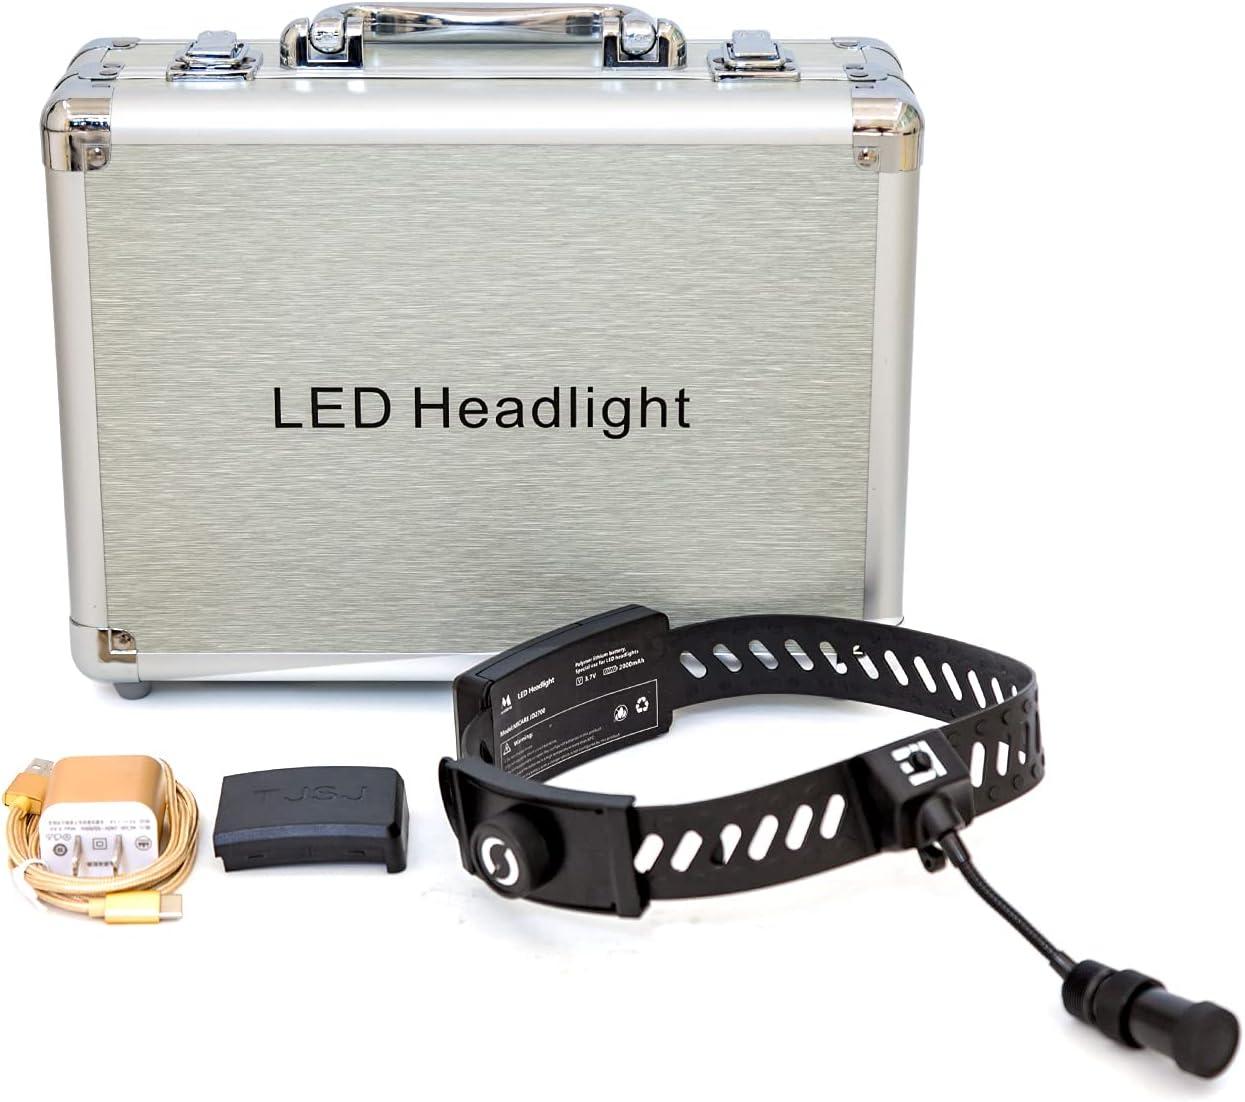 Dental New sales Wireless LED Headlight Light Headband JD2700 Surgical 2021 spring and summer new